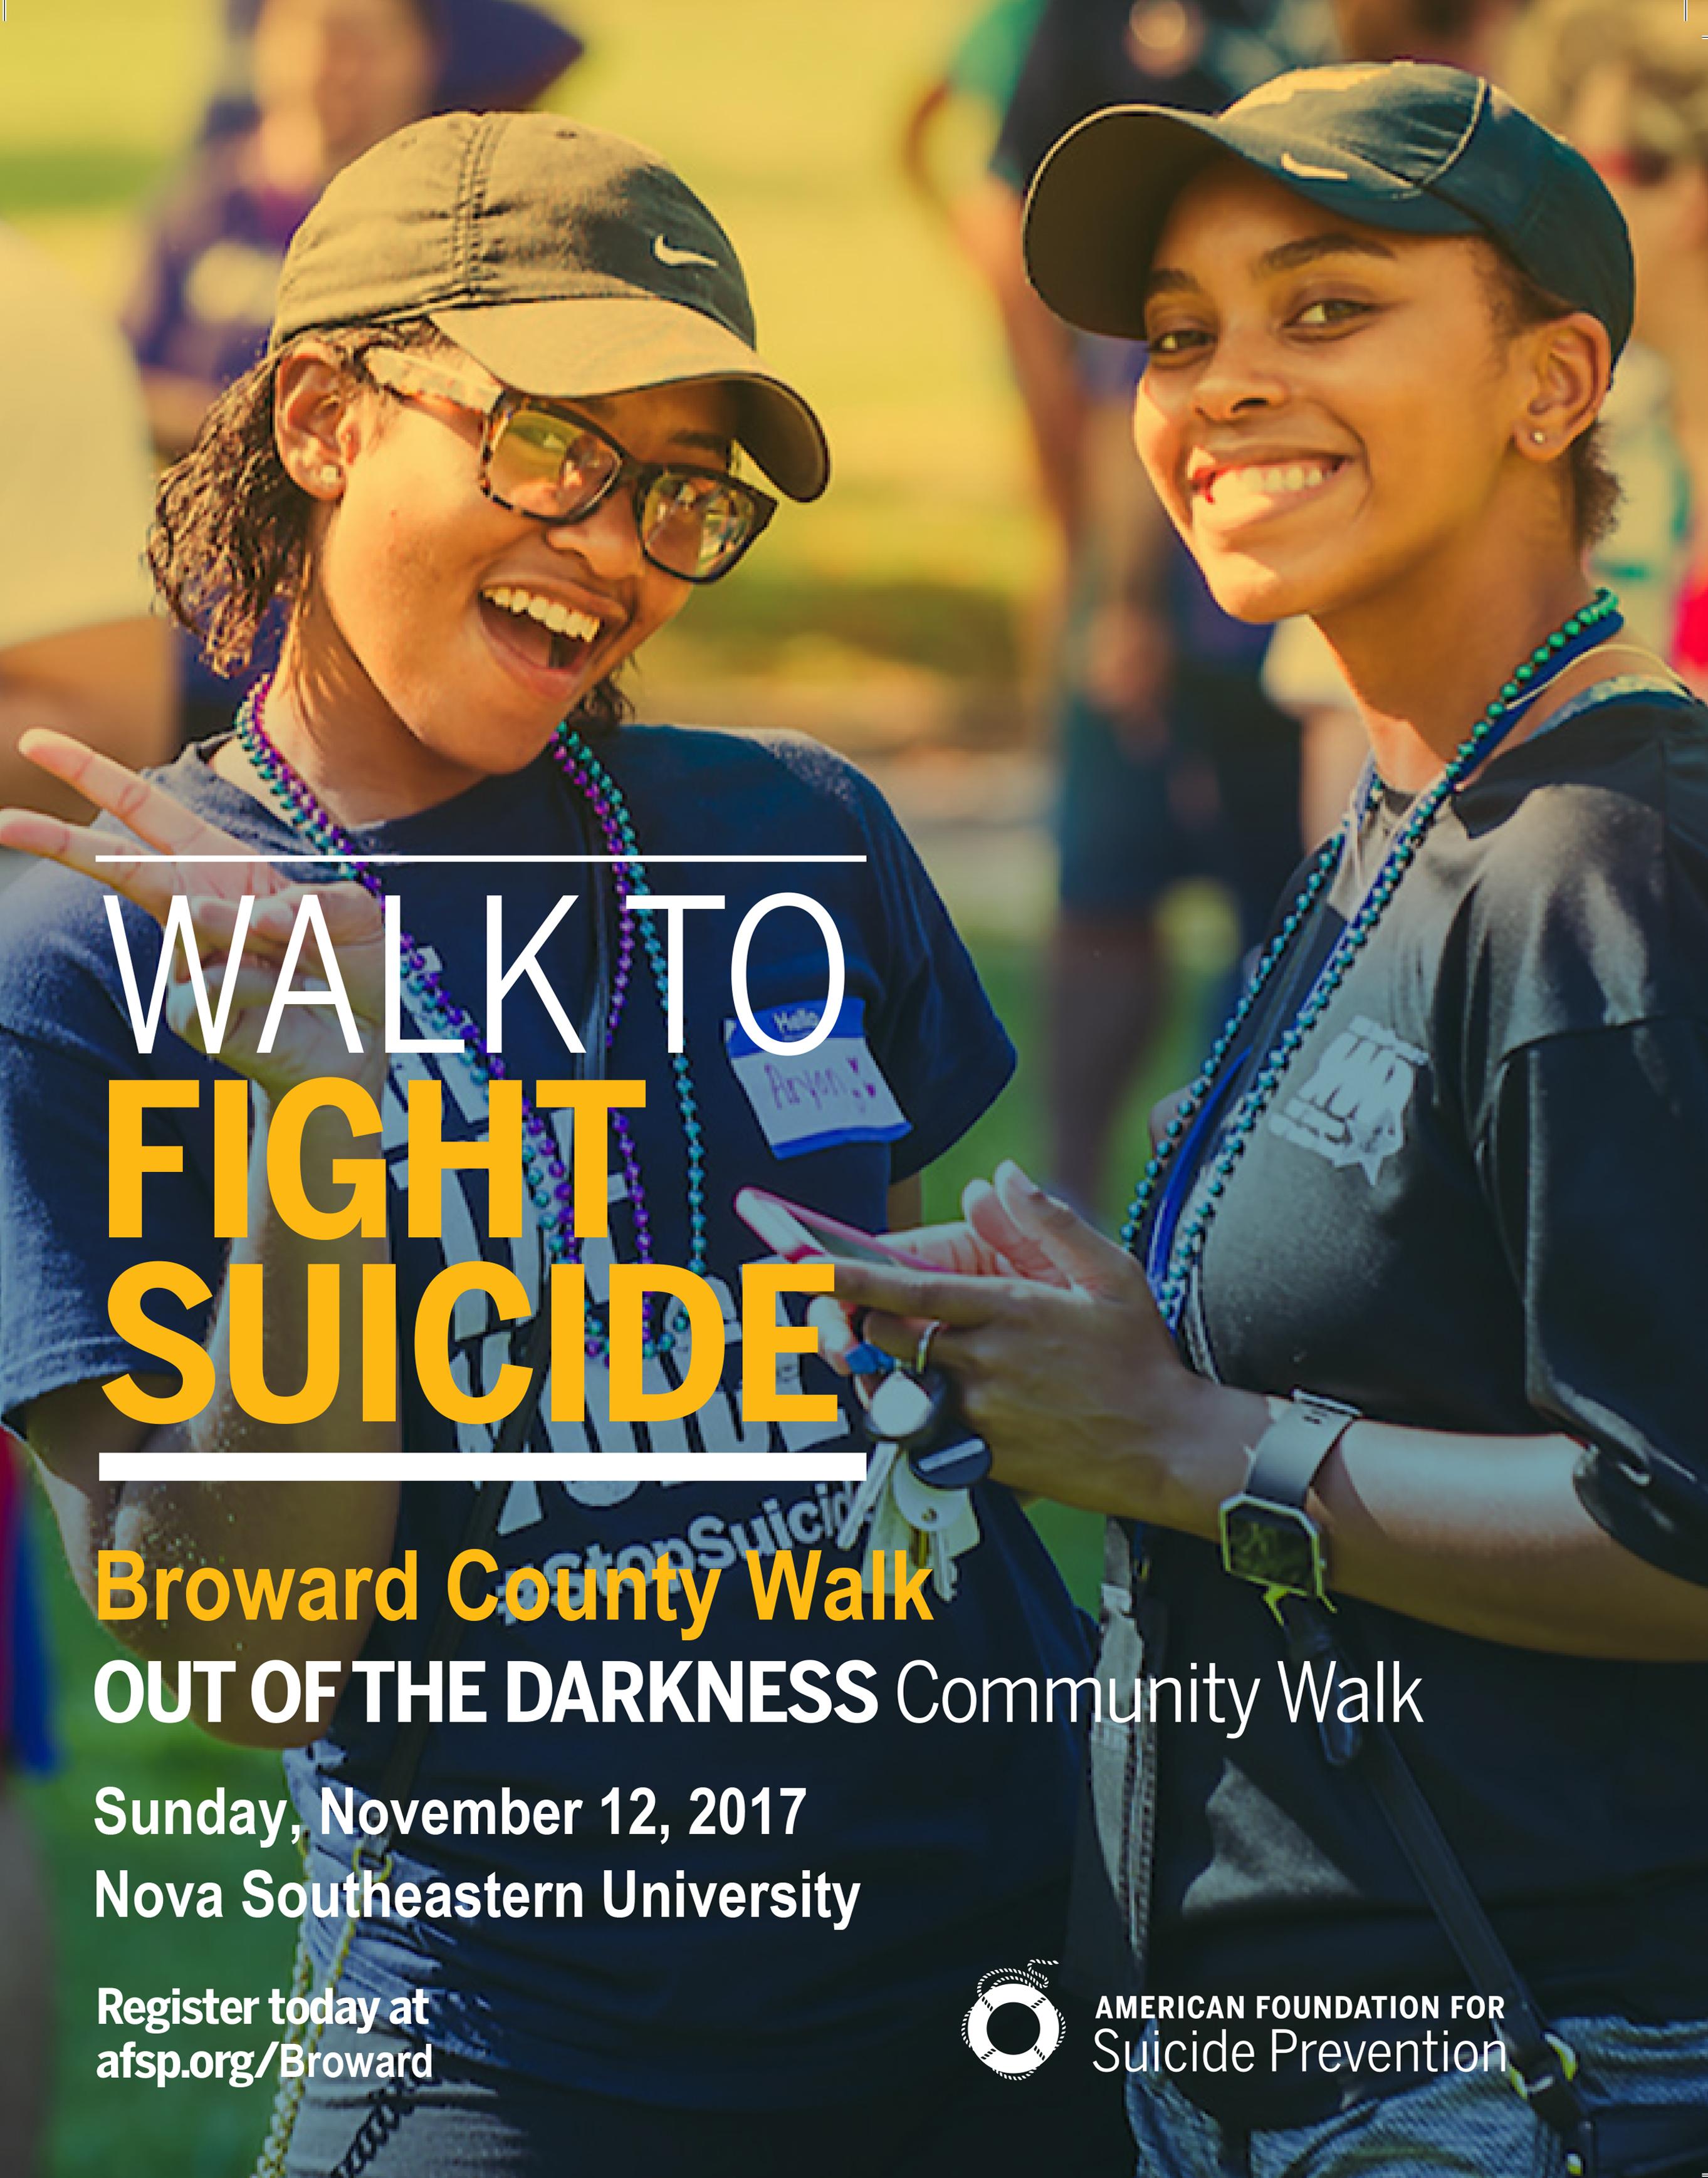 Broward County Walk Flyer 2